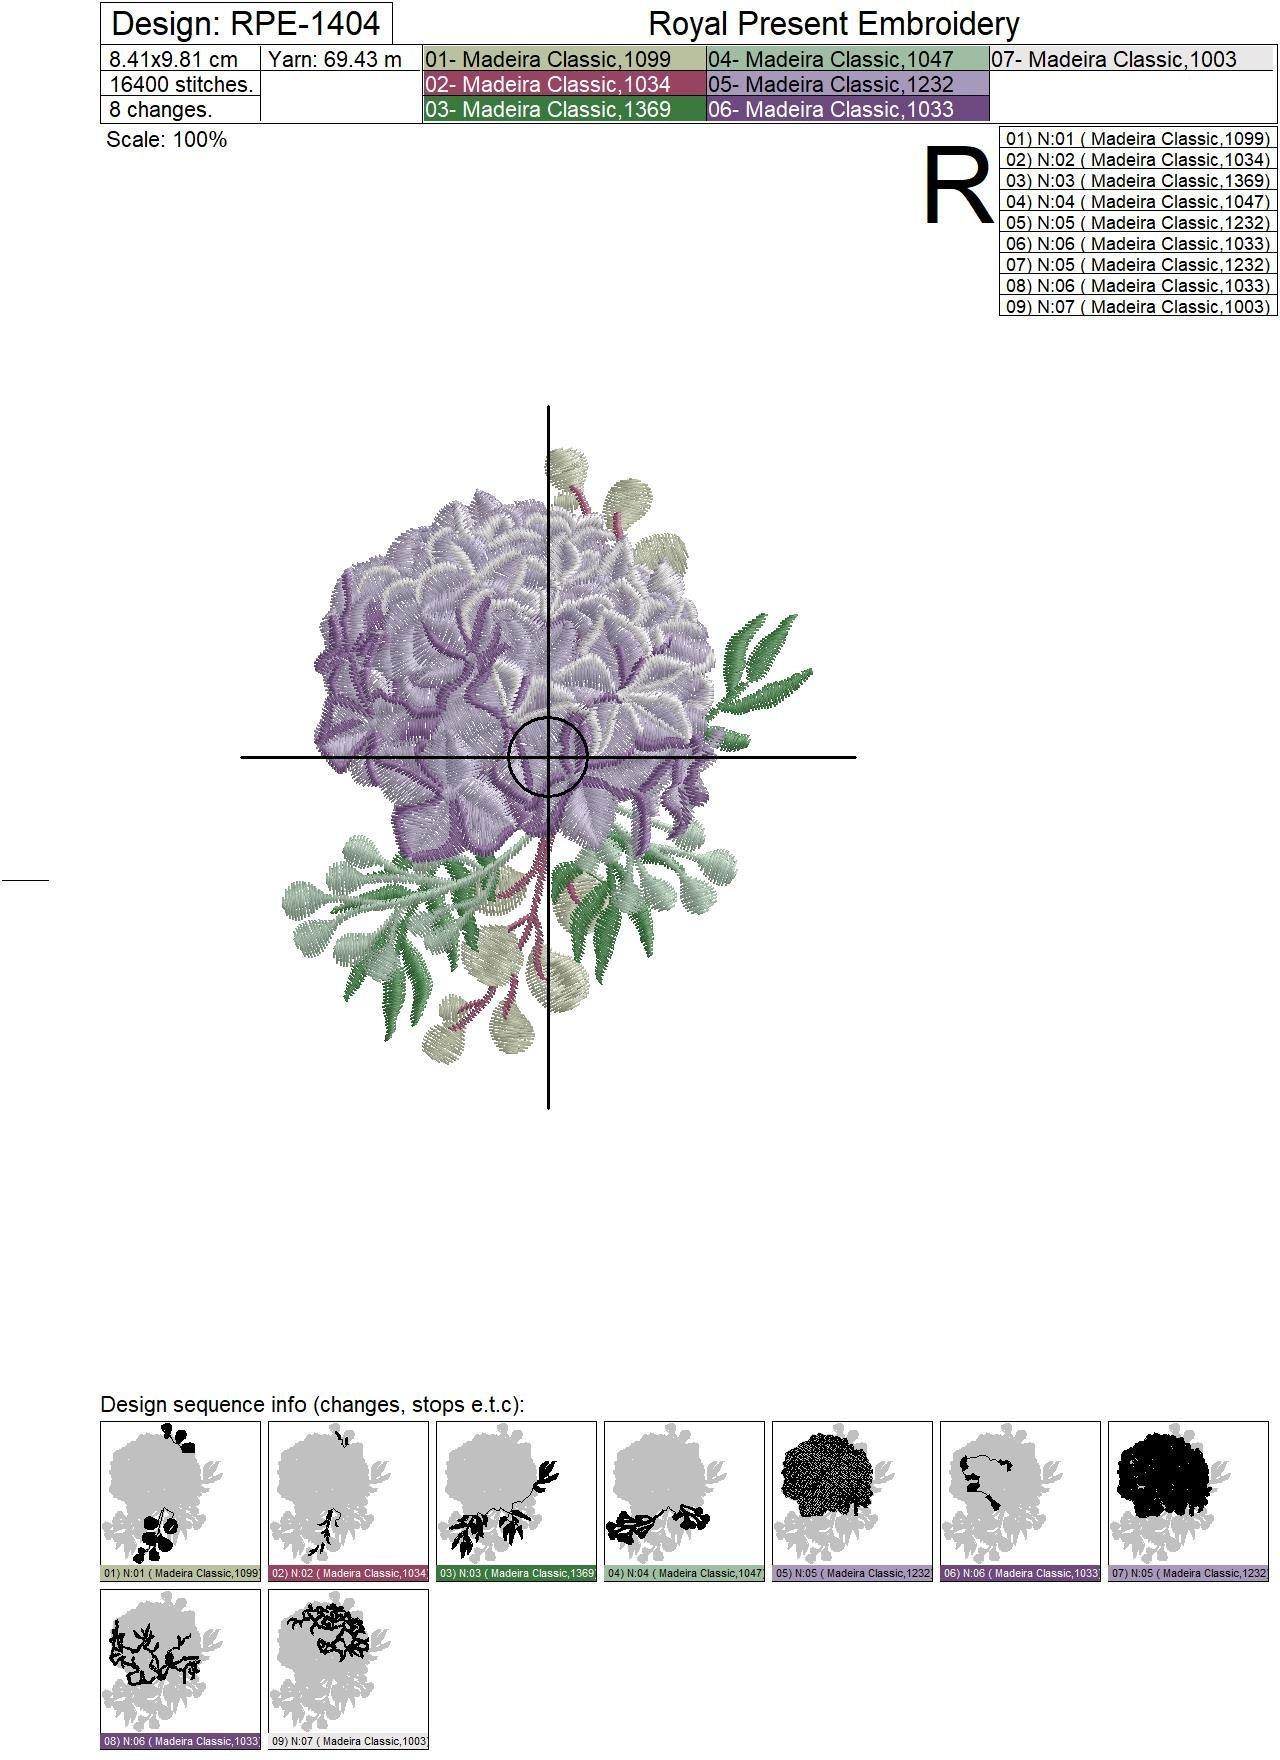 Hydrangea bouquet Machine Embroidery Design - 3 sizes